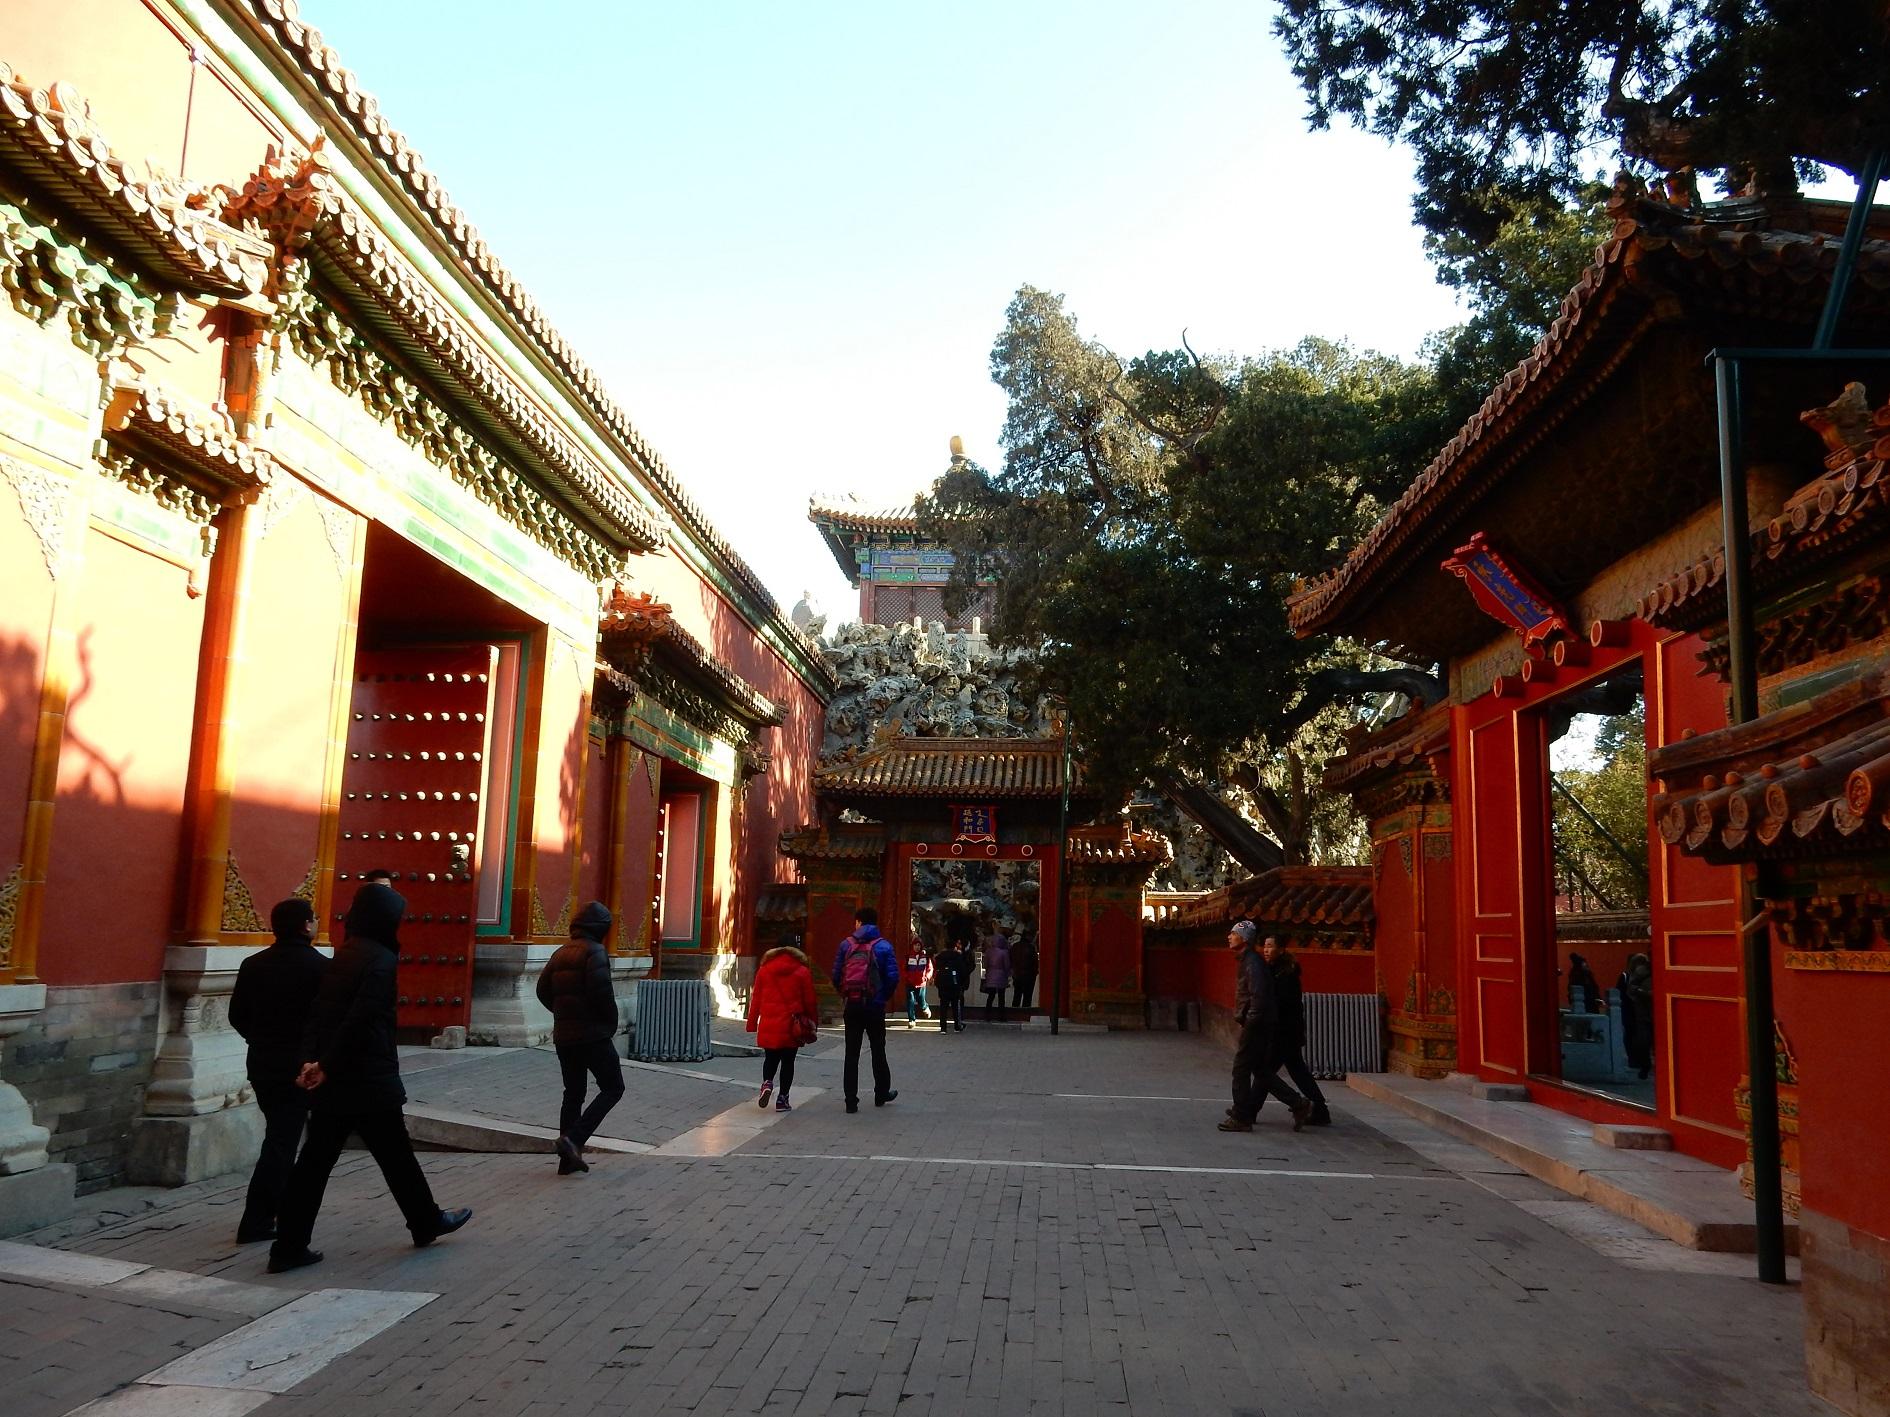 Beijing_Forbidden_City_Tiltott_Varos_Peking_paintings